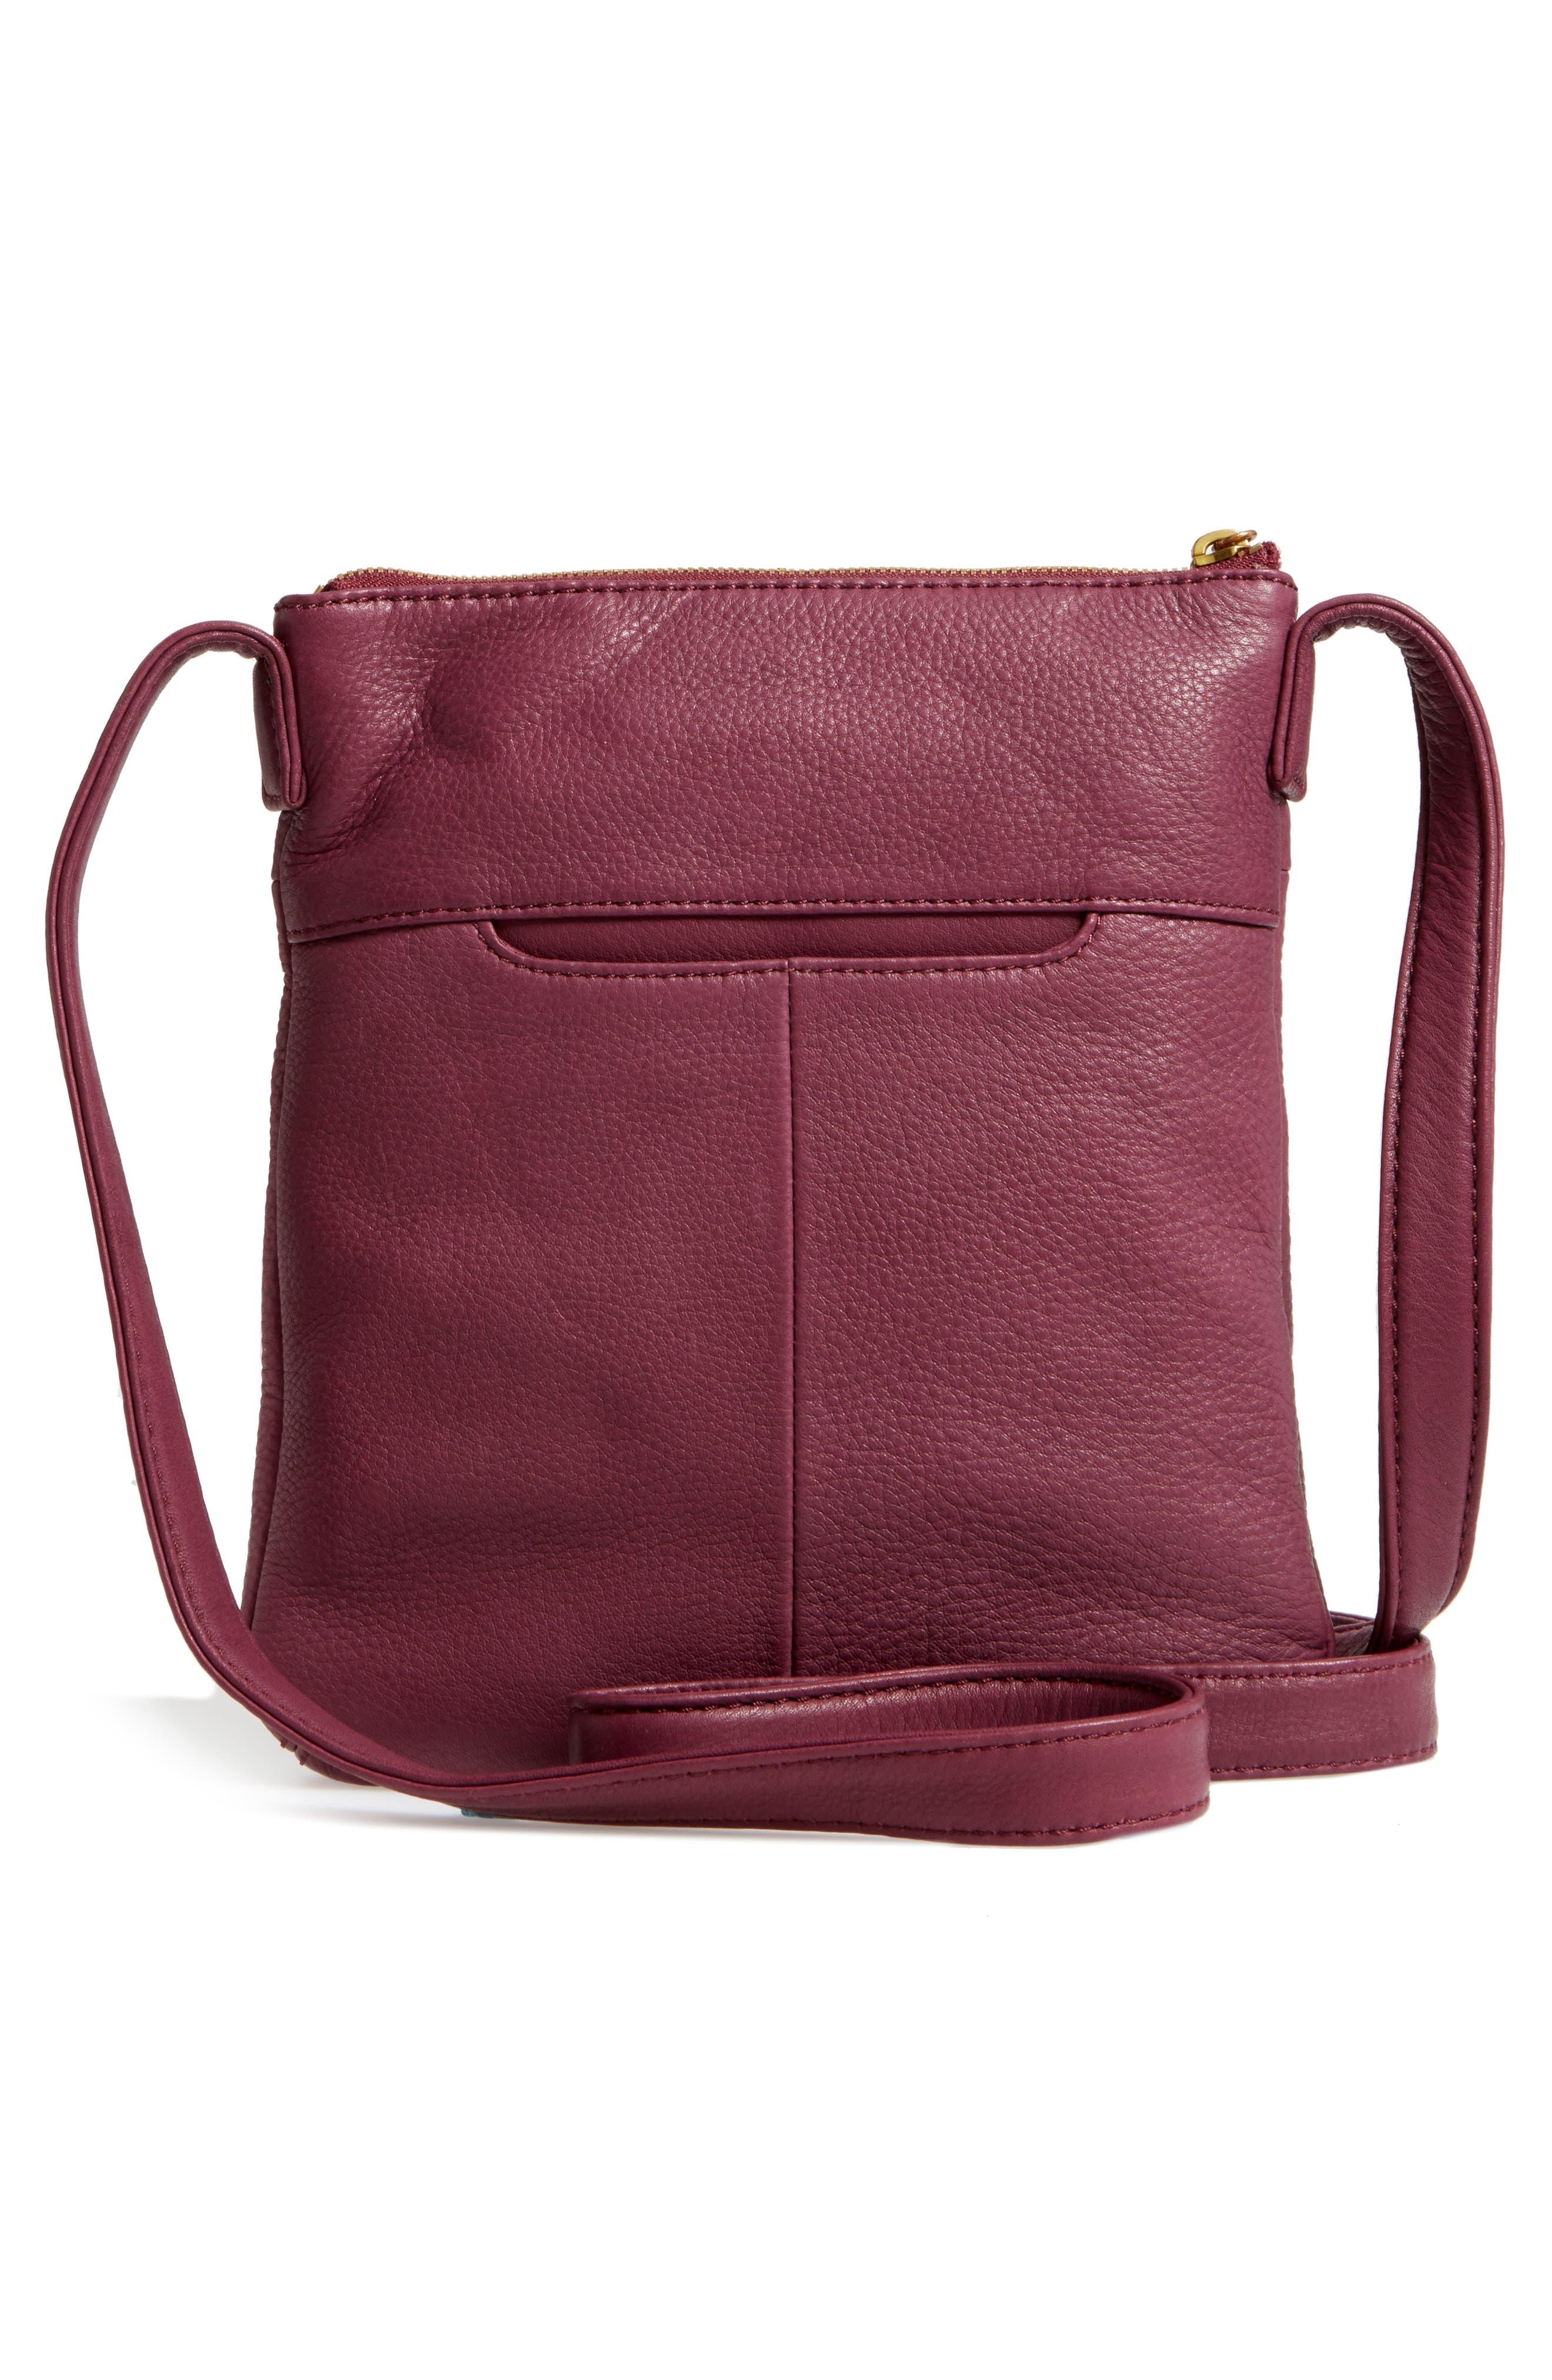 'Sarah' Leather Crossbody Bag,                             Alternate thumbnail 17, color,